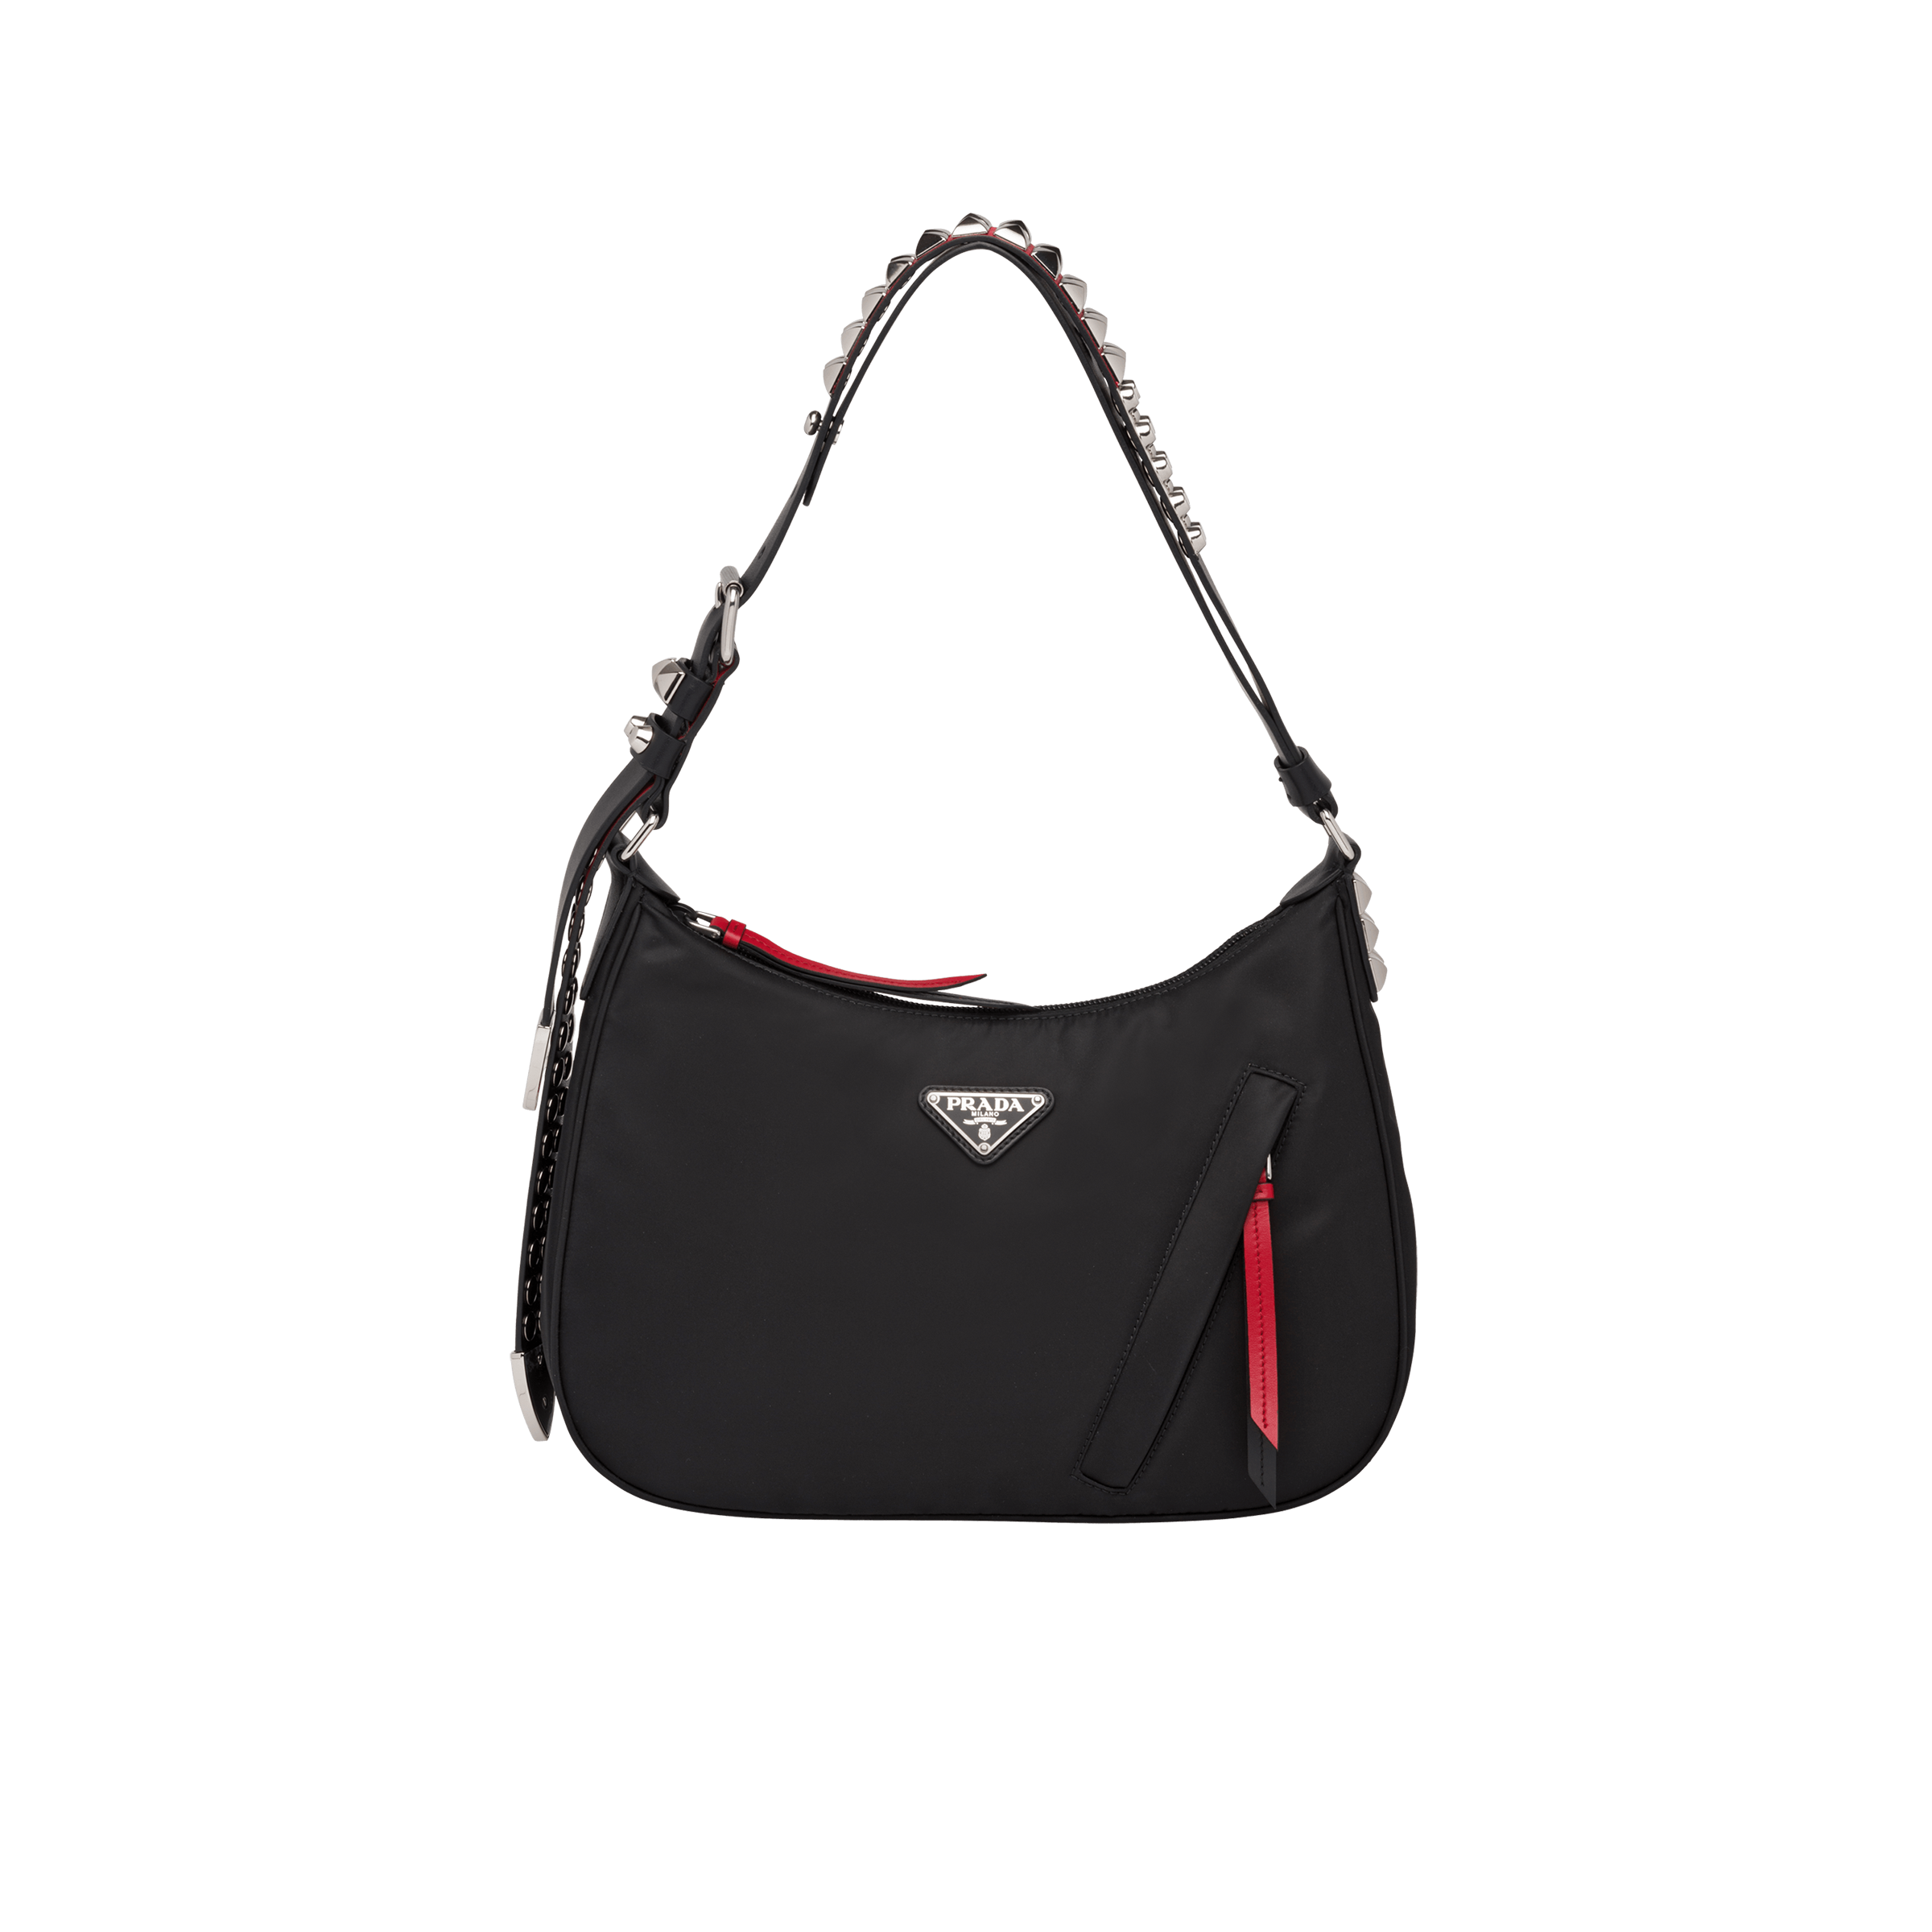 43a004fabfc923 Women's Prada Nylon | Prada